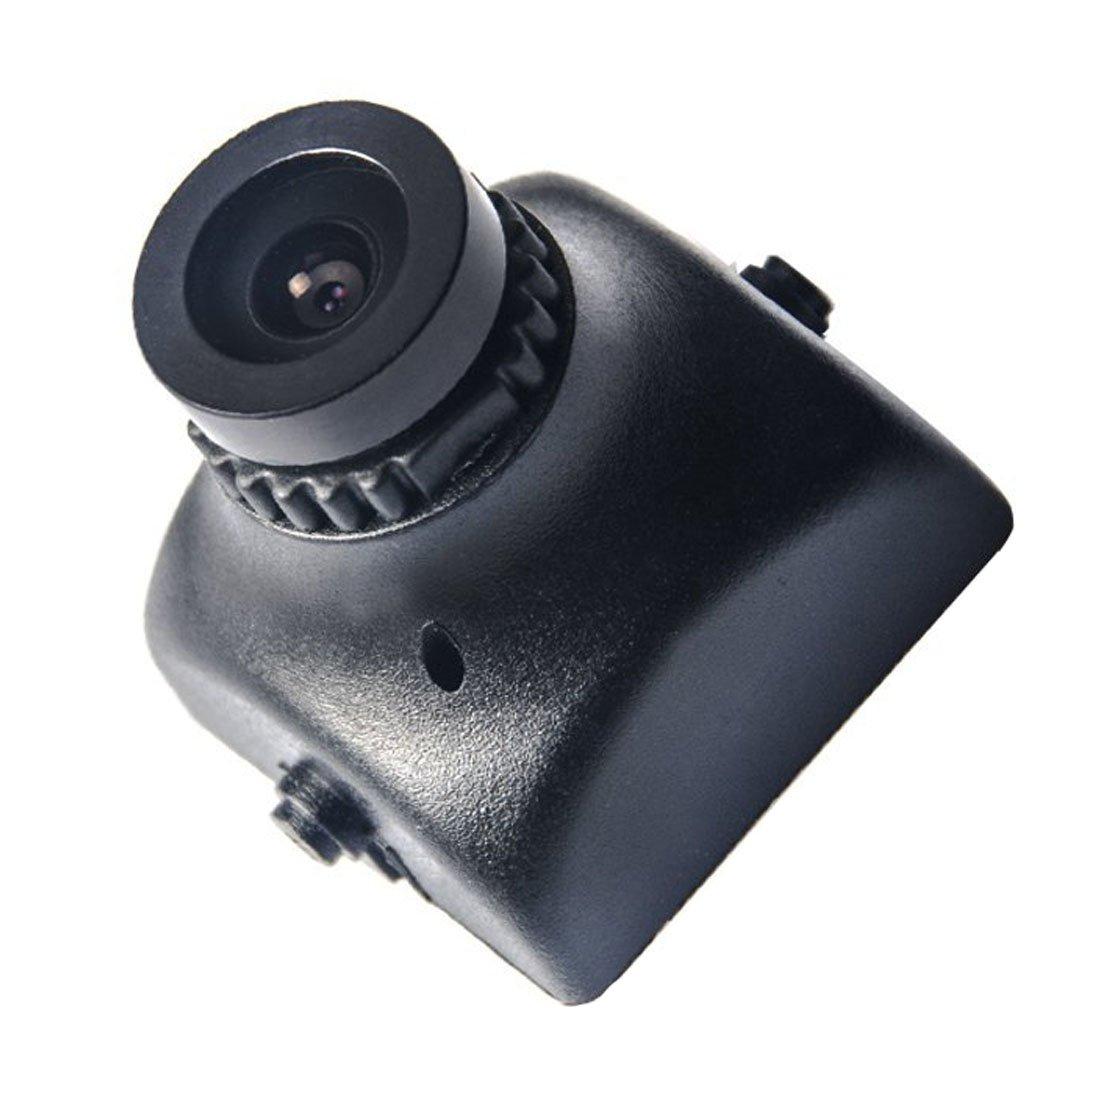 GOQOTOMO GC04 Mini 2.8MM 700TVL NTSC Automatic gain CMOS Camera for FPV Drone